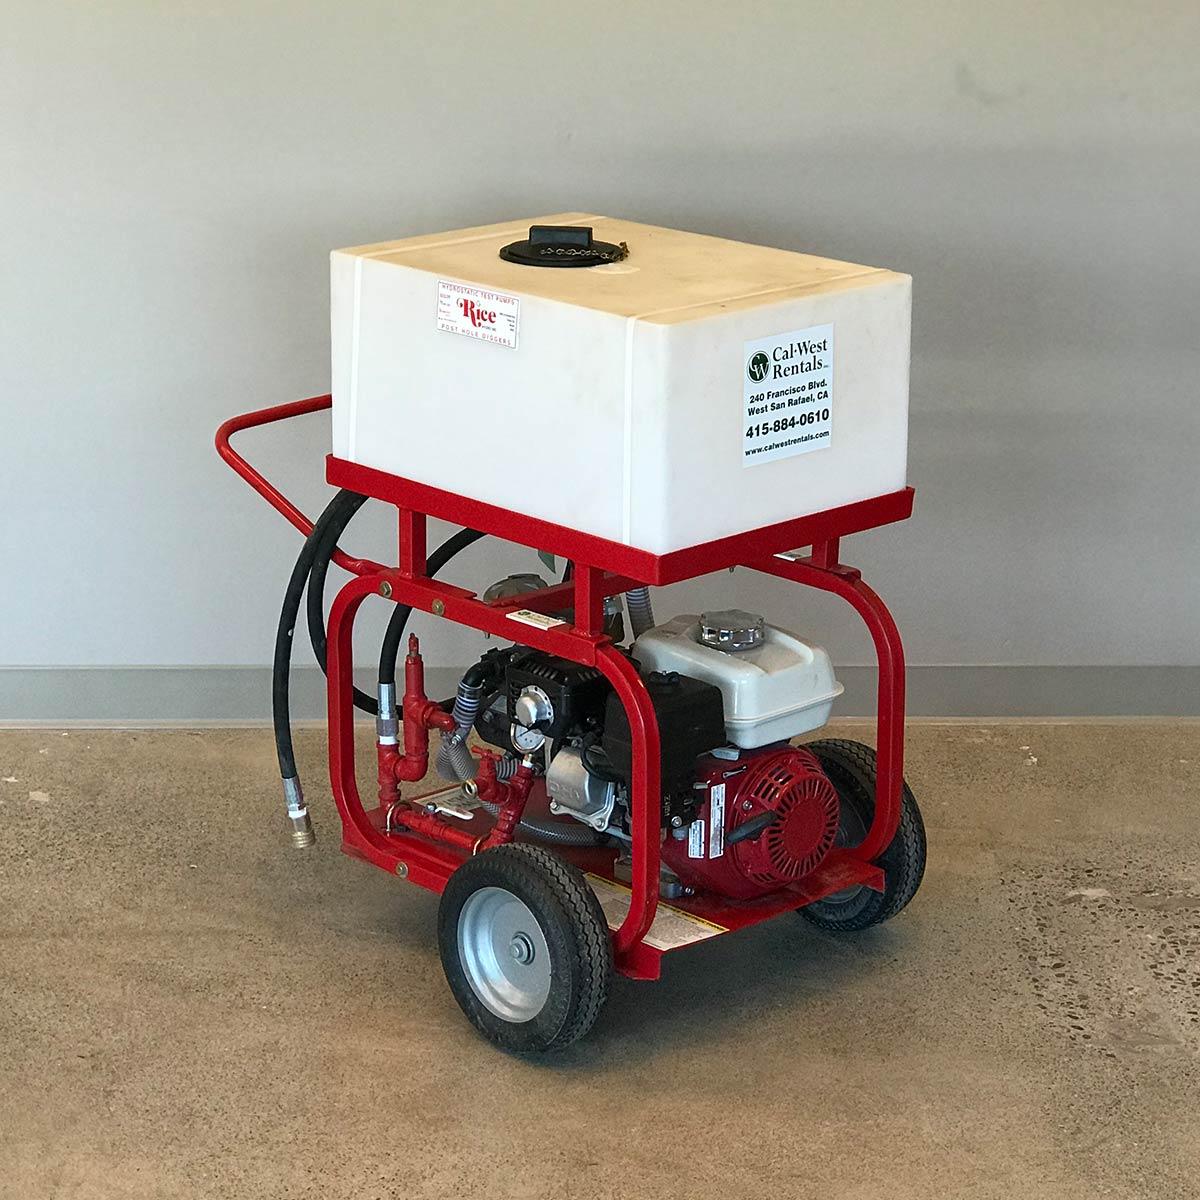 Rice Hydro Hydrostatic Test Pump DPH-3B (4)